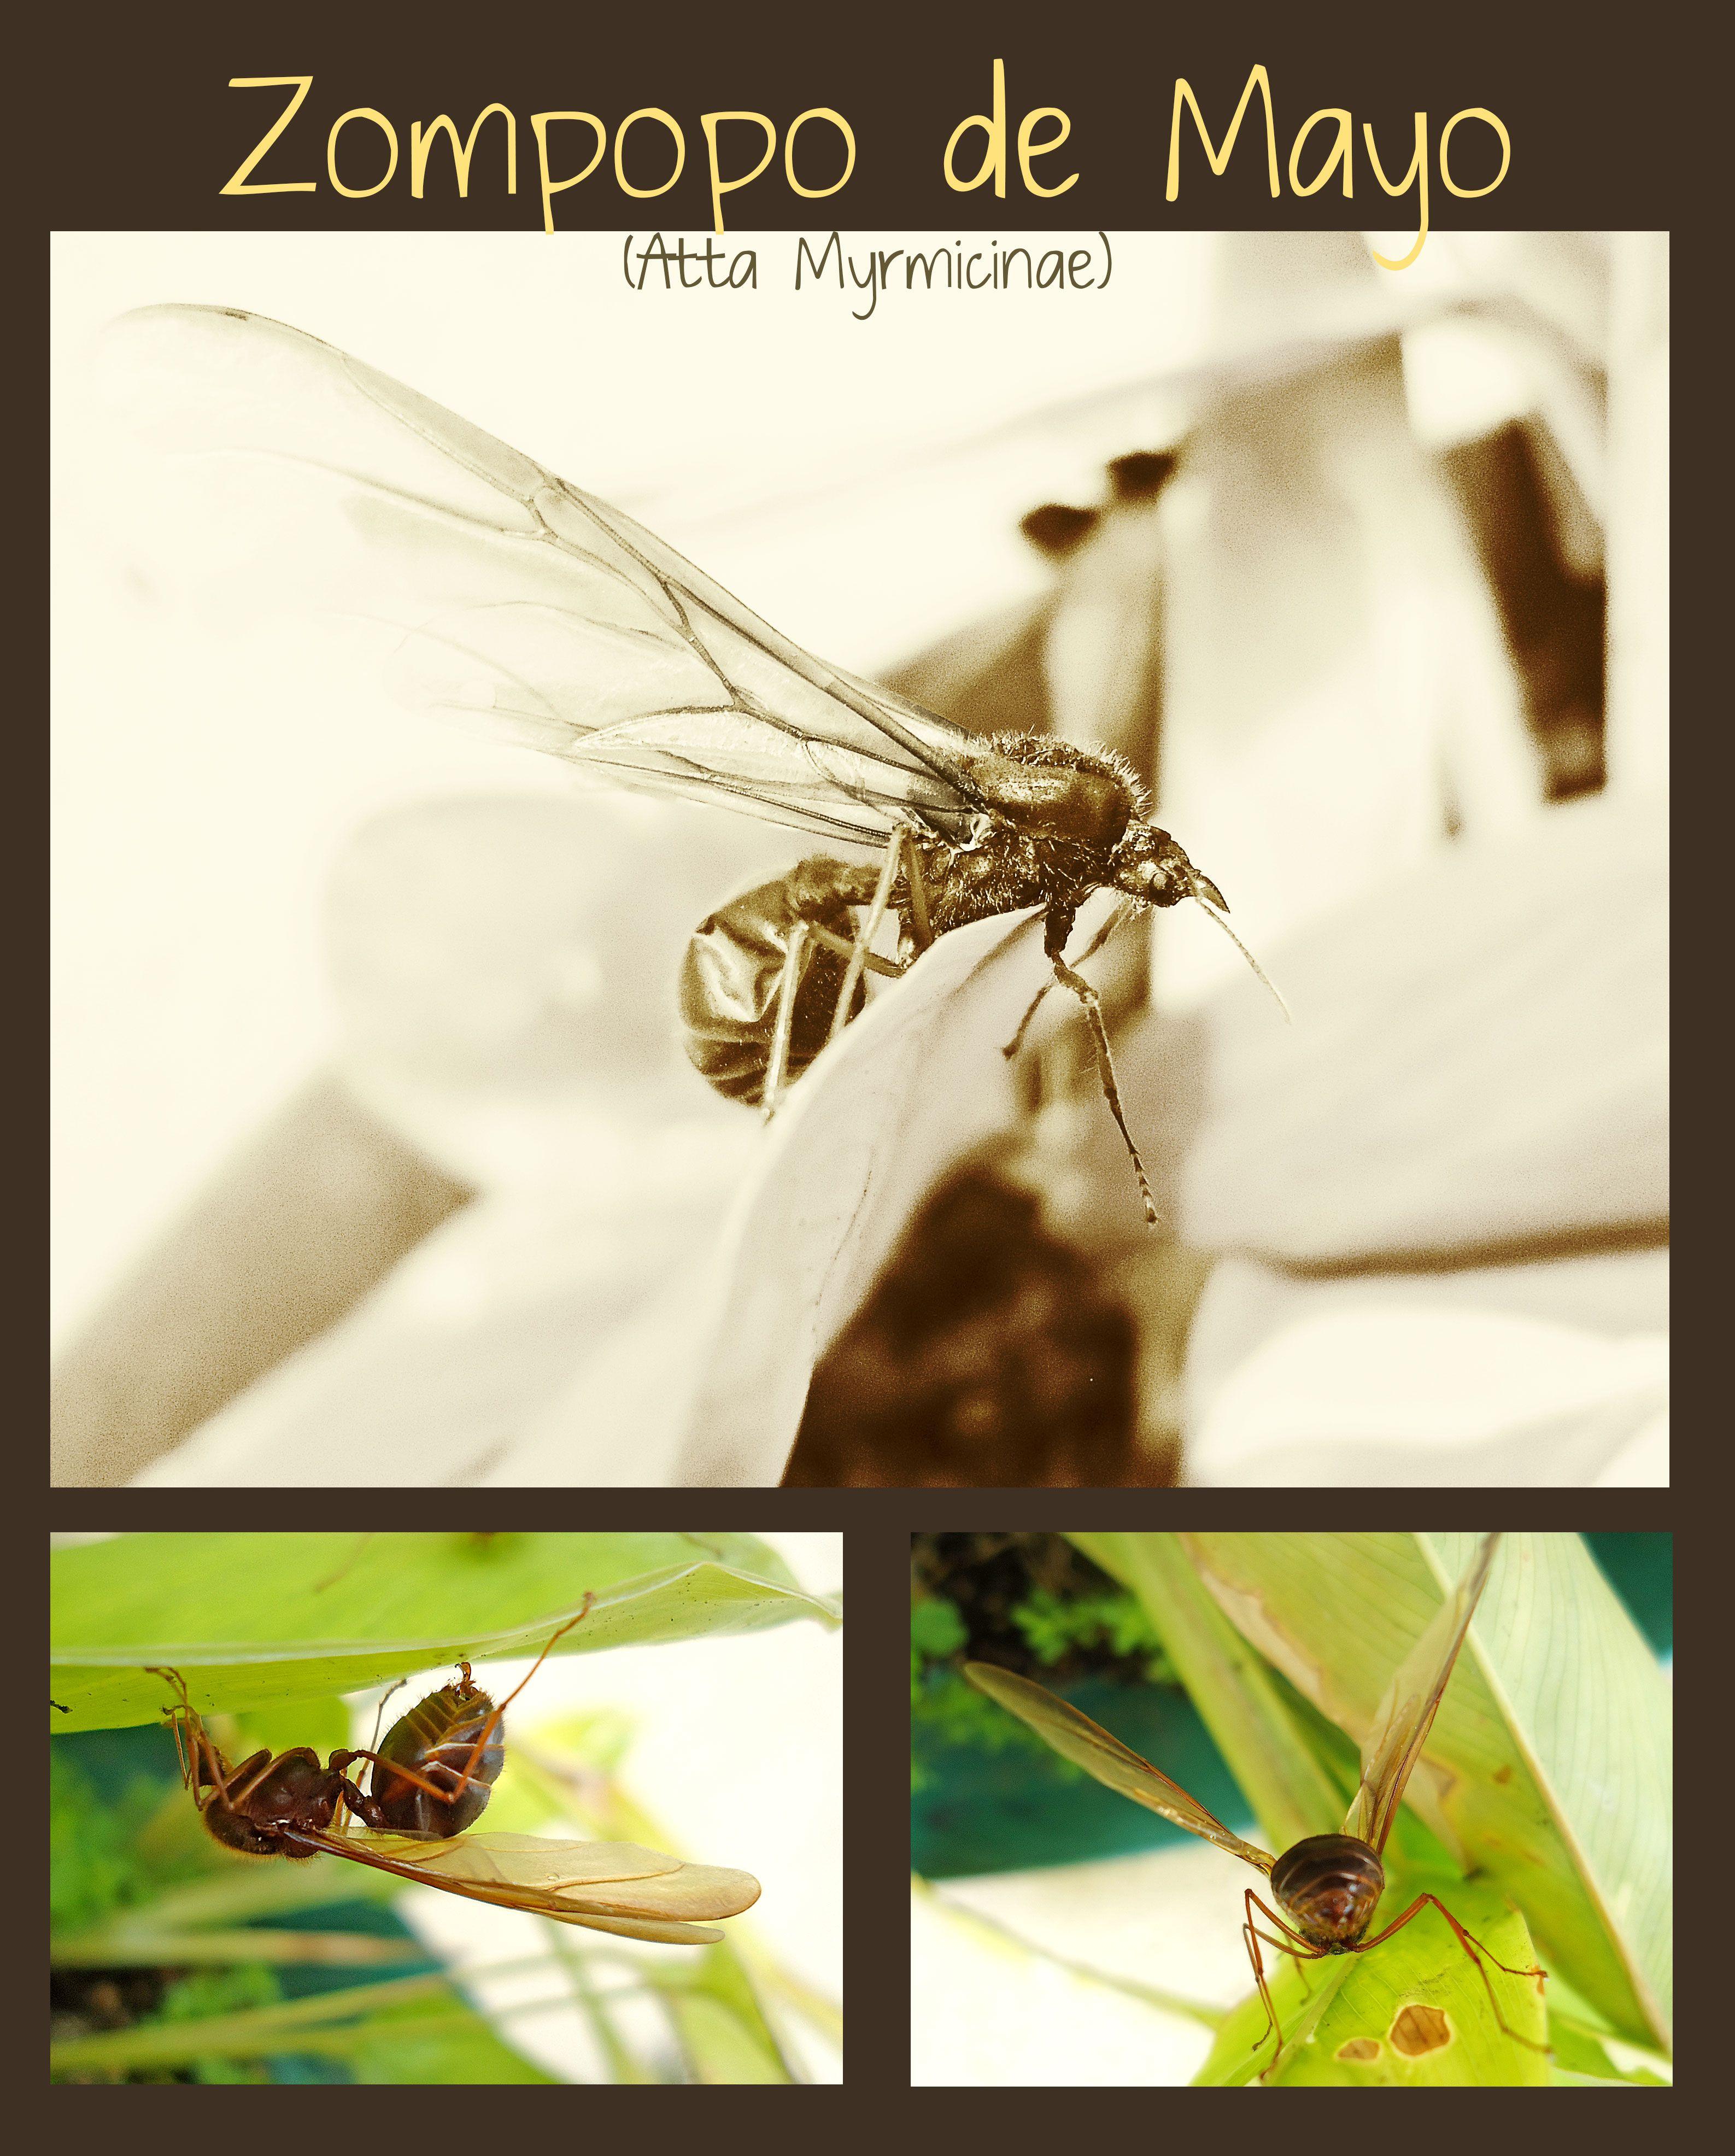 Zompopo De Mayo Guatemala Hormiga Gigante Zompopo Atta Ants